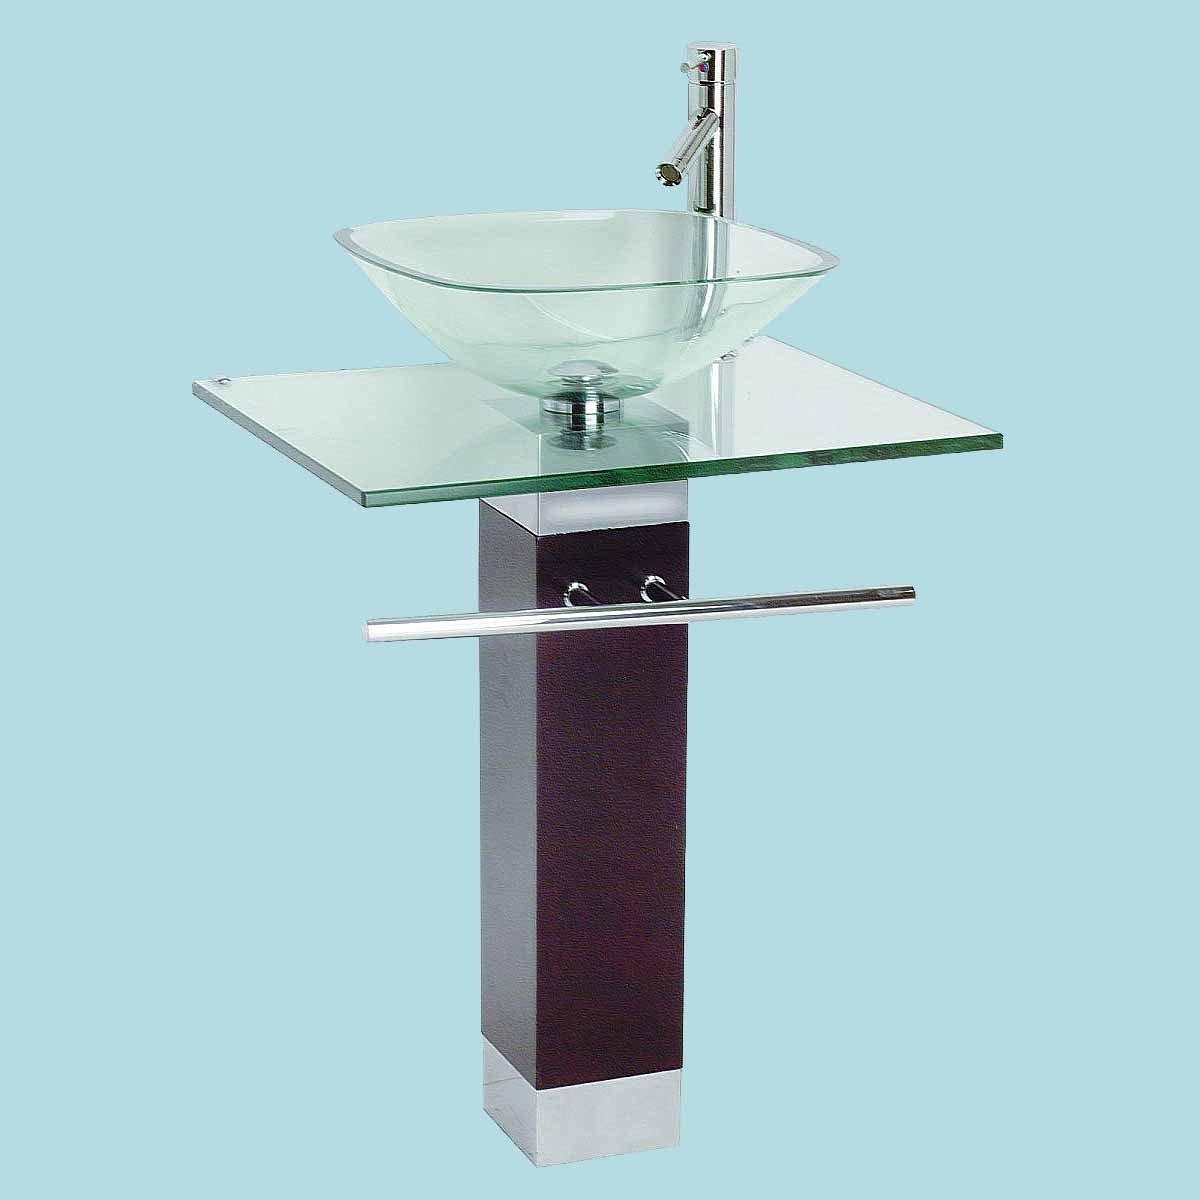 retrospect plumbings standard co pedestal installation mounting size kit sink globalstory plumbing large of info